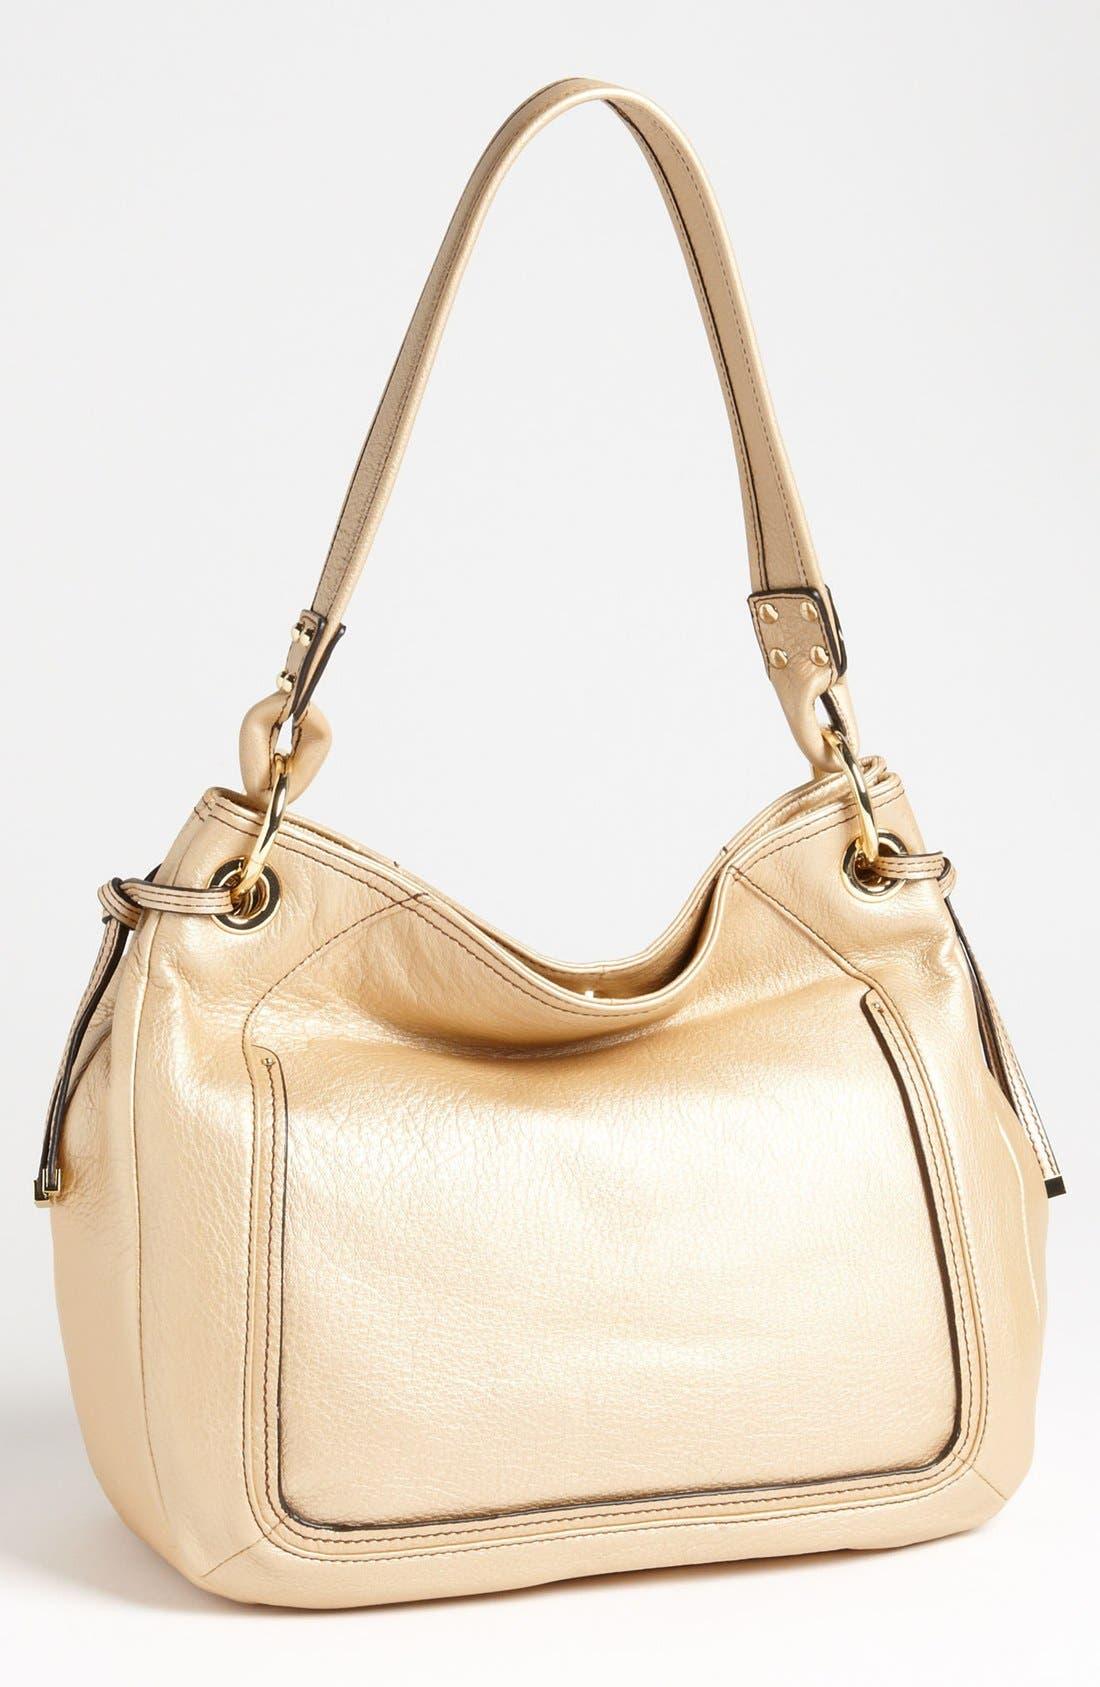 Alternate Image 1 Selected - Perlina 'Simone' Leather Hobo, Medium